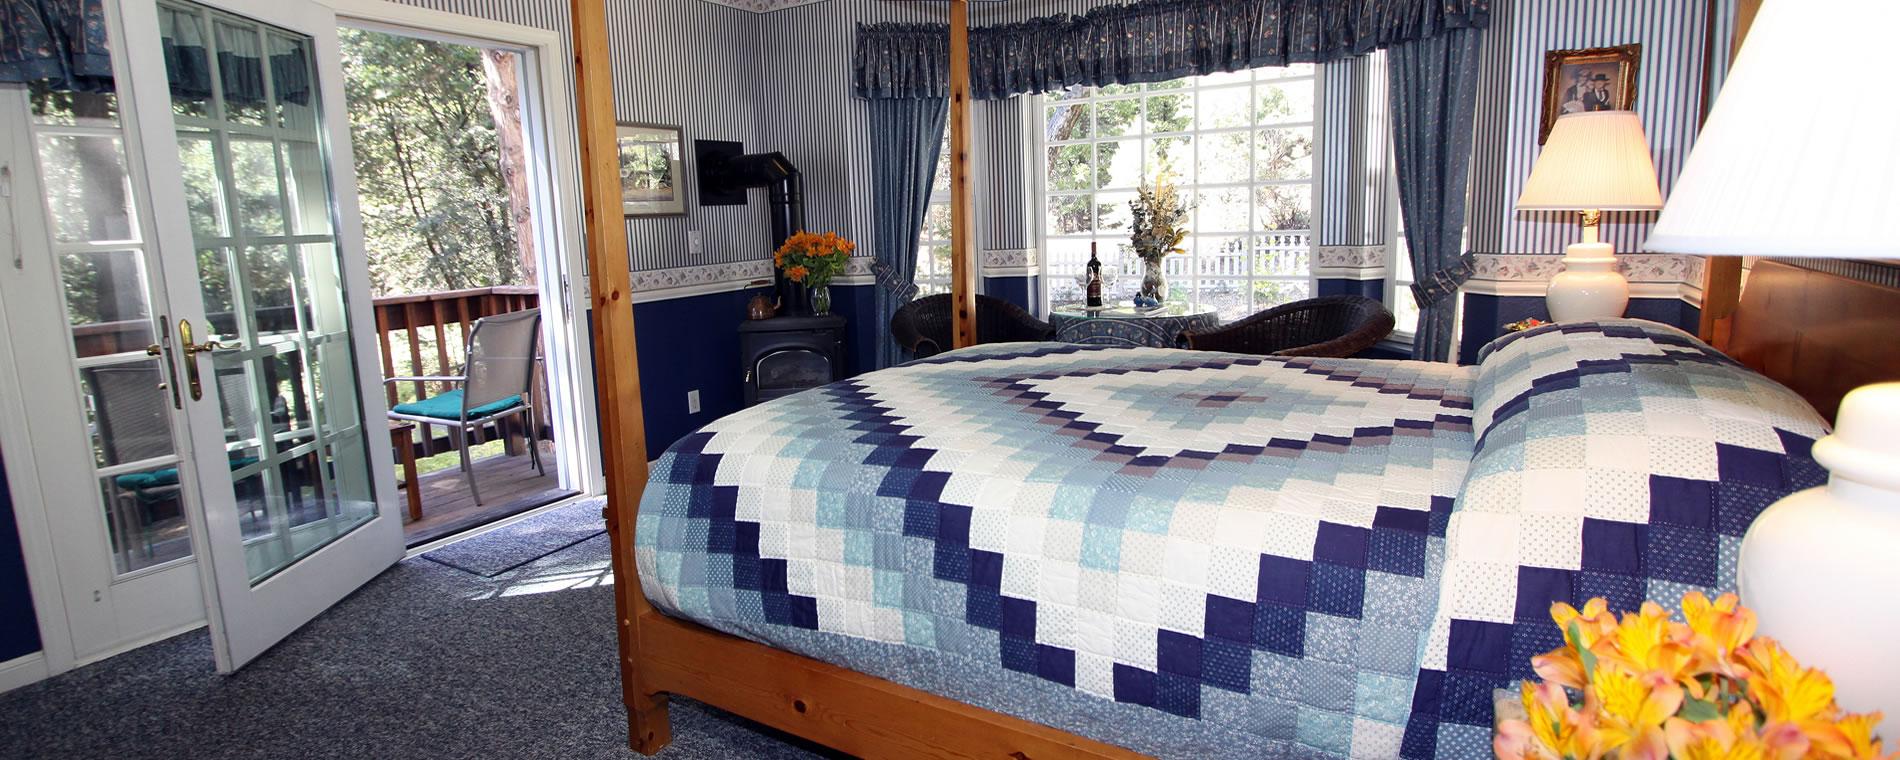 mccaffrey-house-bedroom